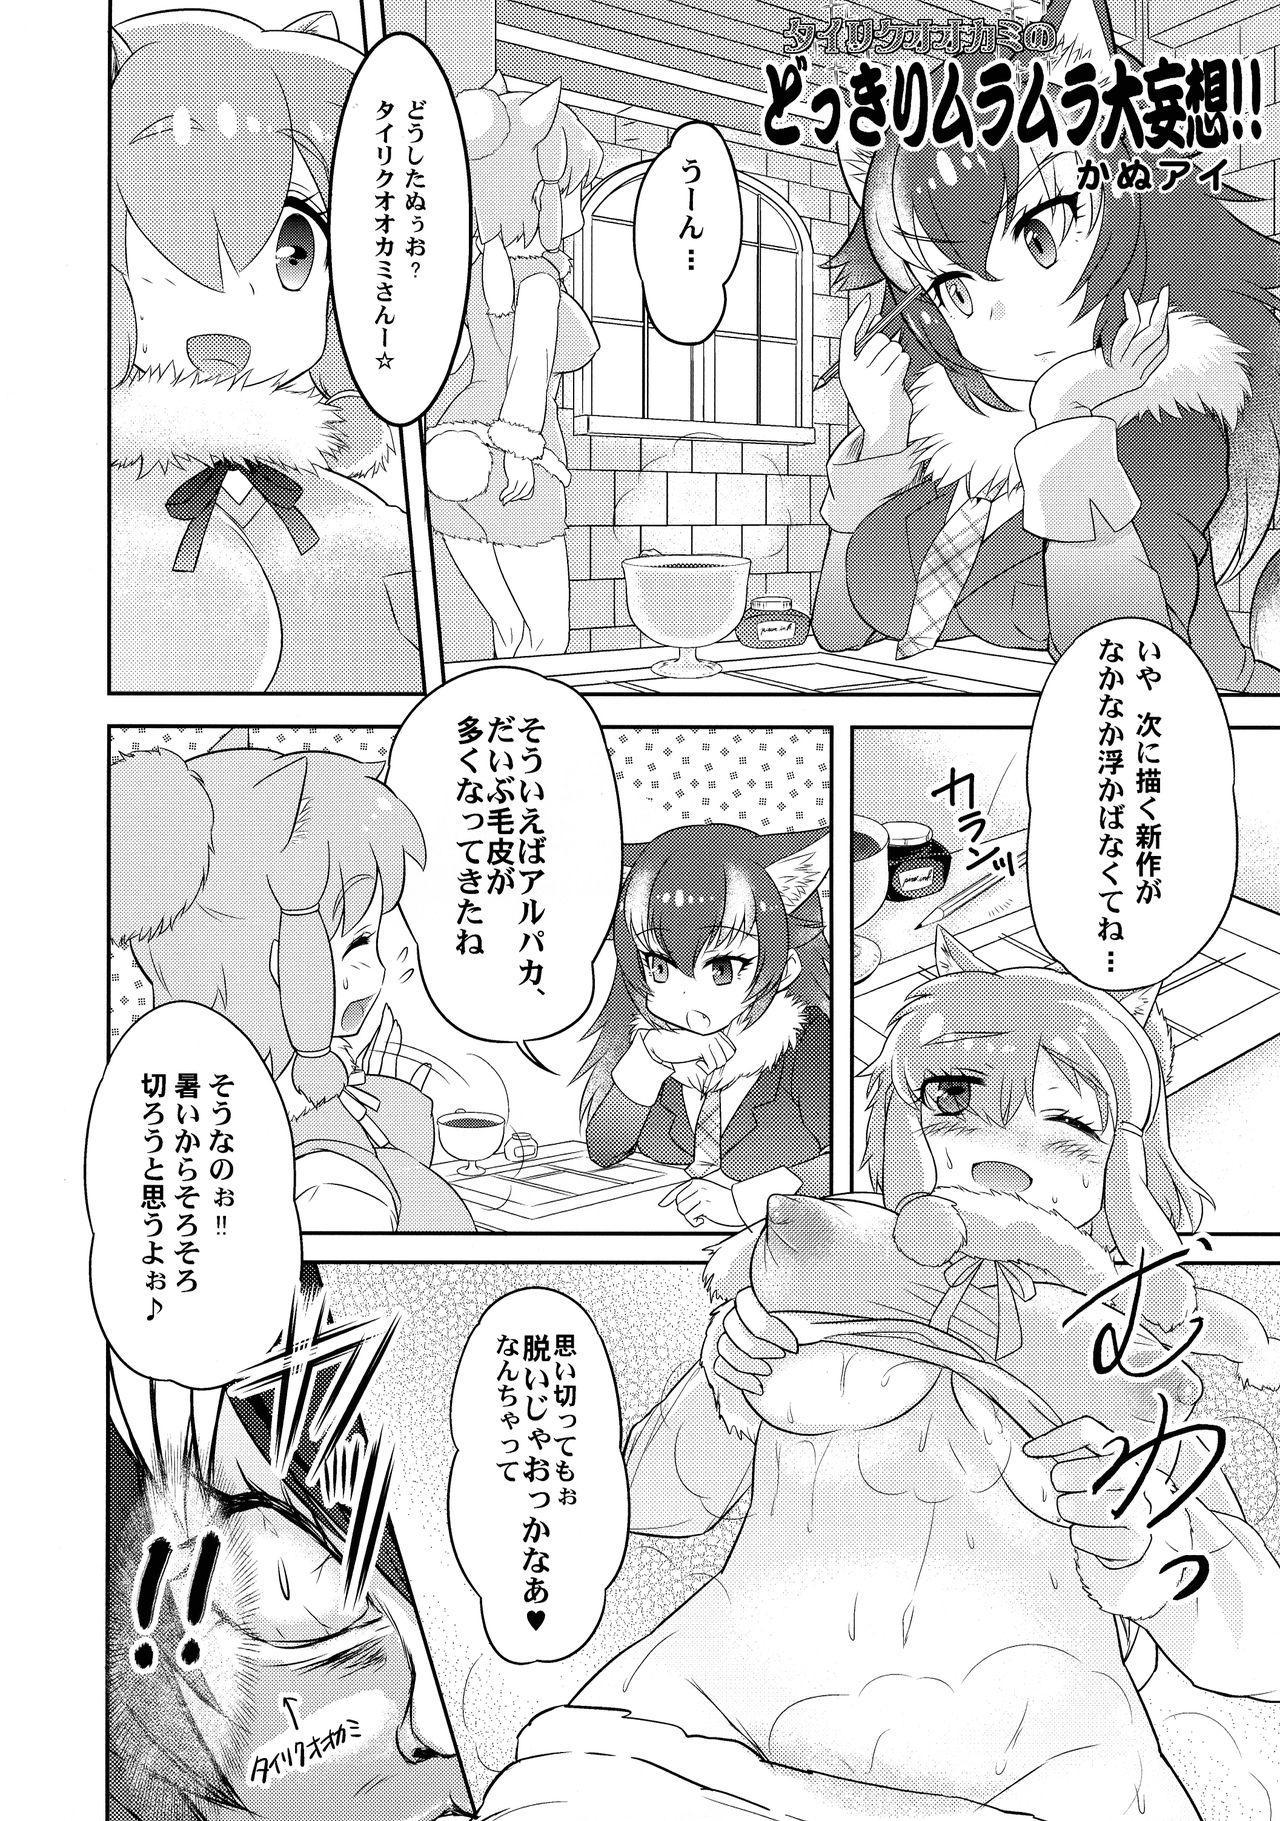 Fuwaaa! Irasshaai! Ura Iyashi no Alpaca-san Goudou 37